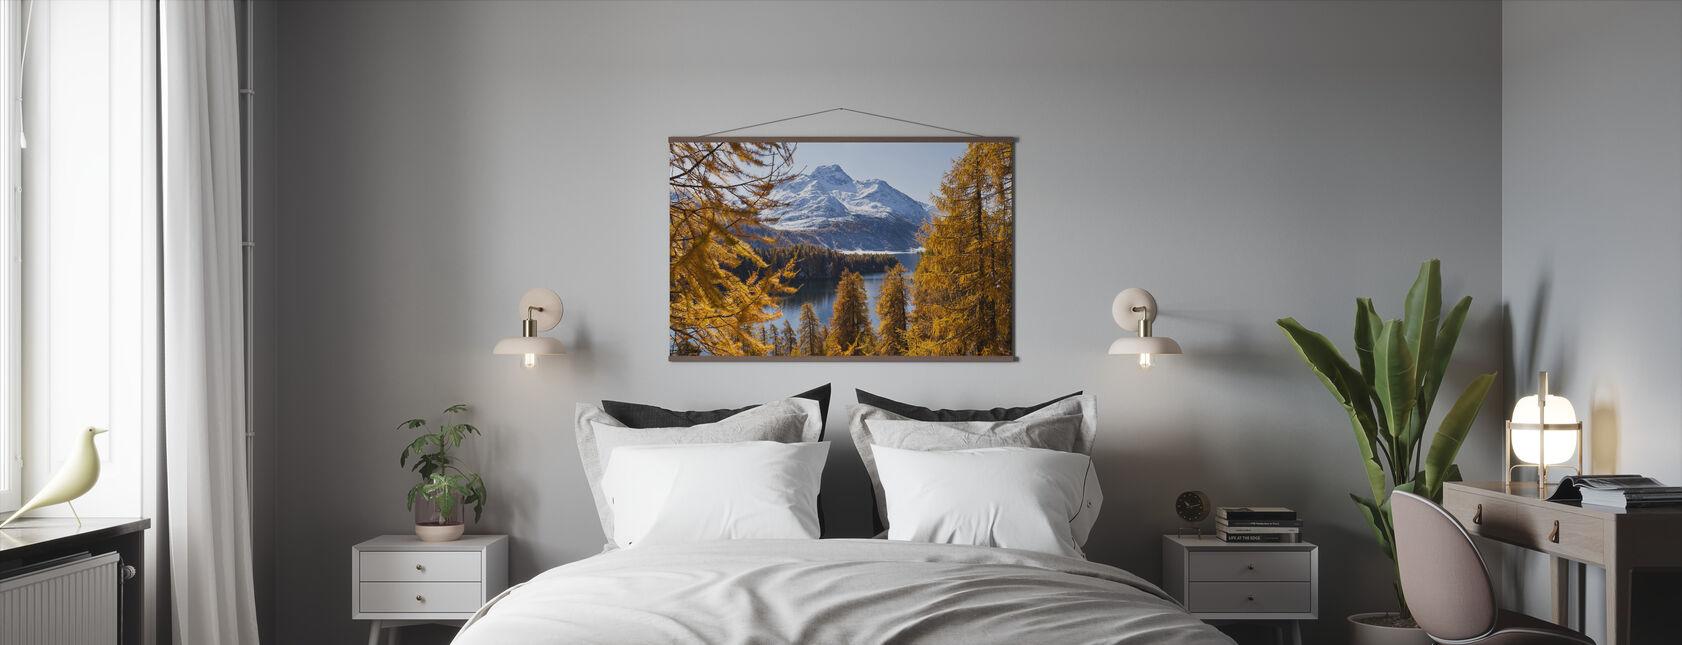 Zwitserse Lariks Bomen - Poster - Slaapkamer